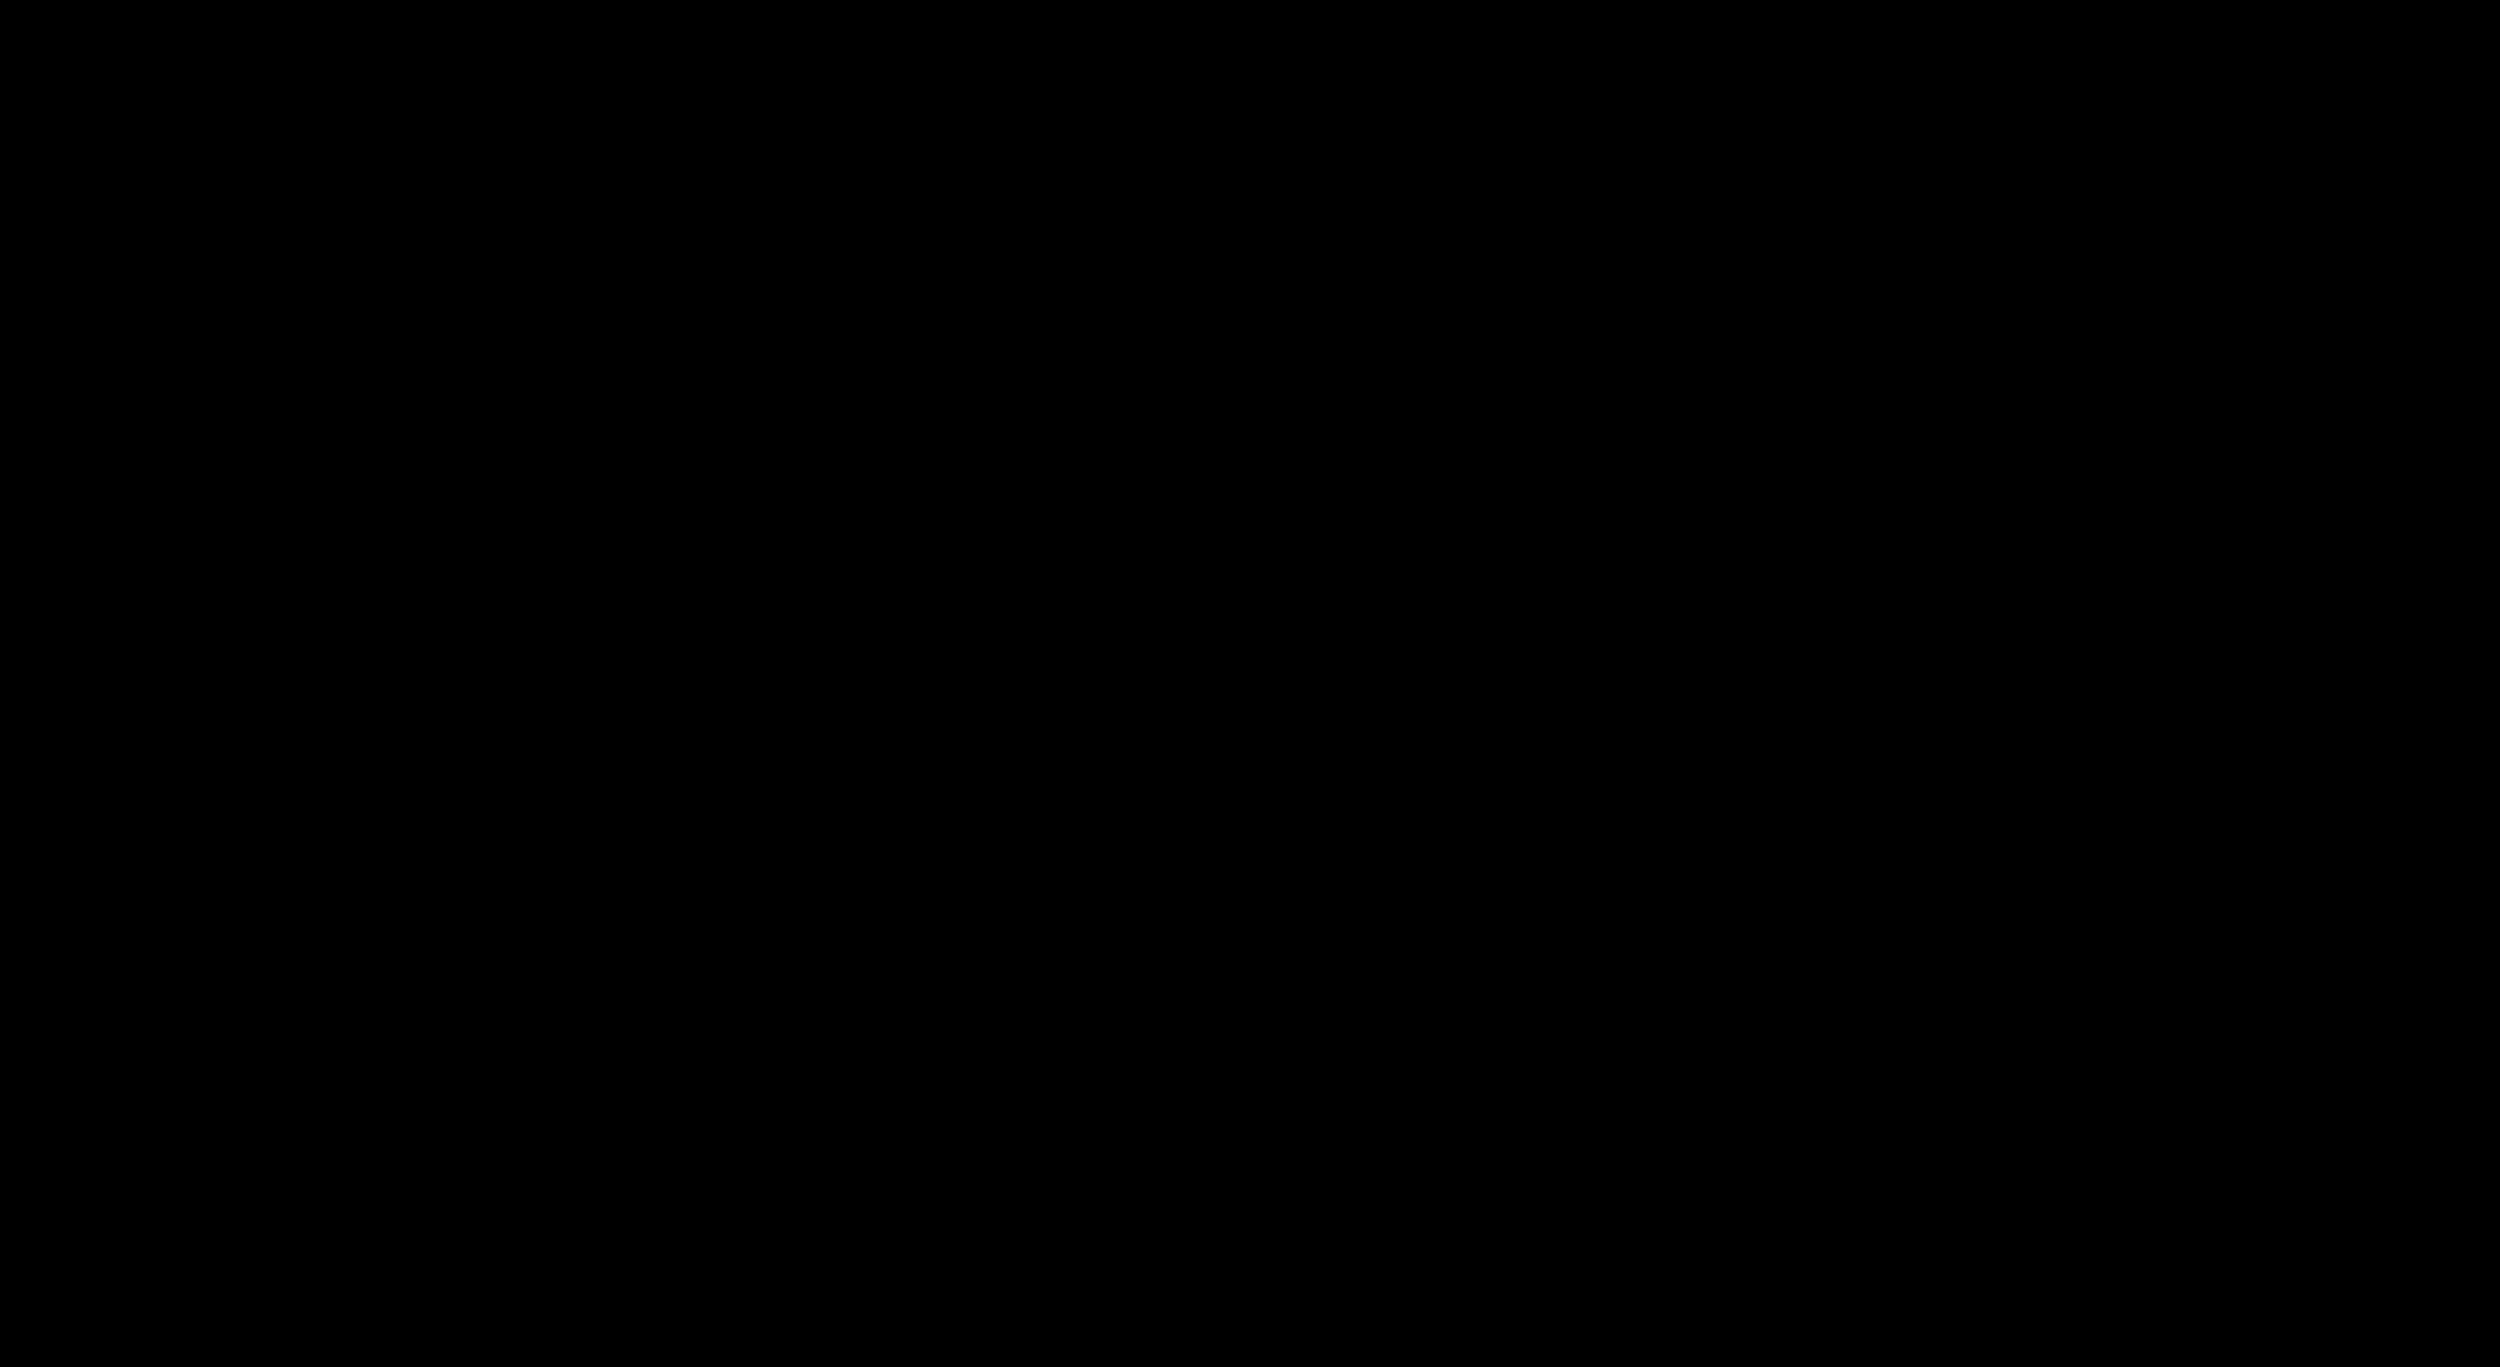 Logo Black  Download PNG